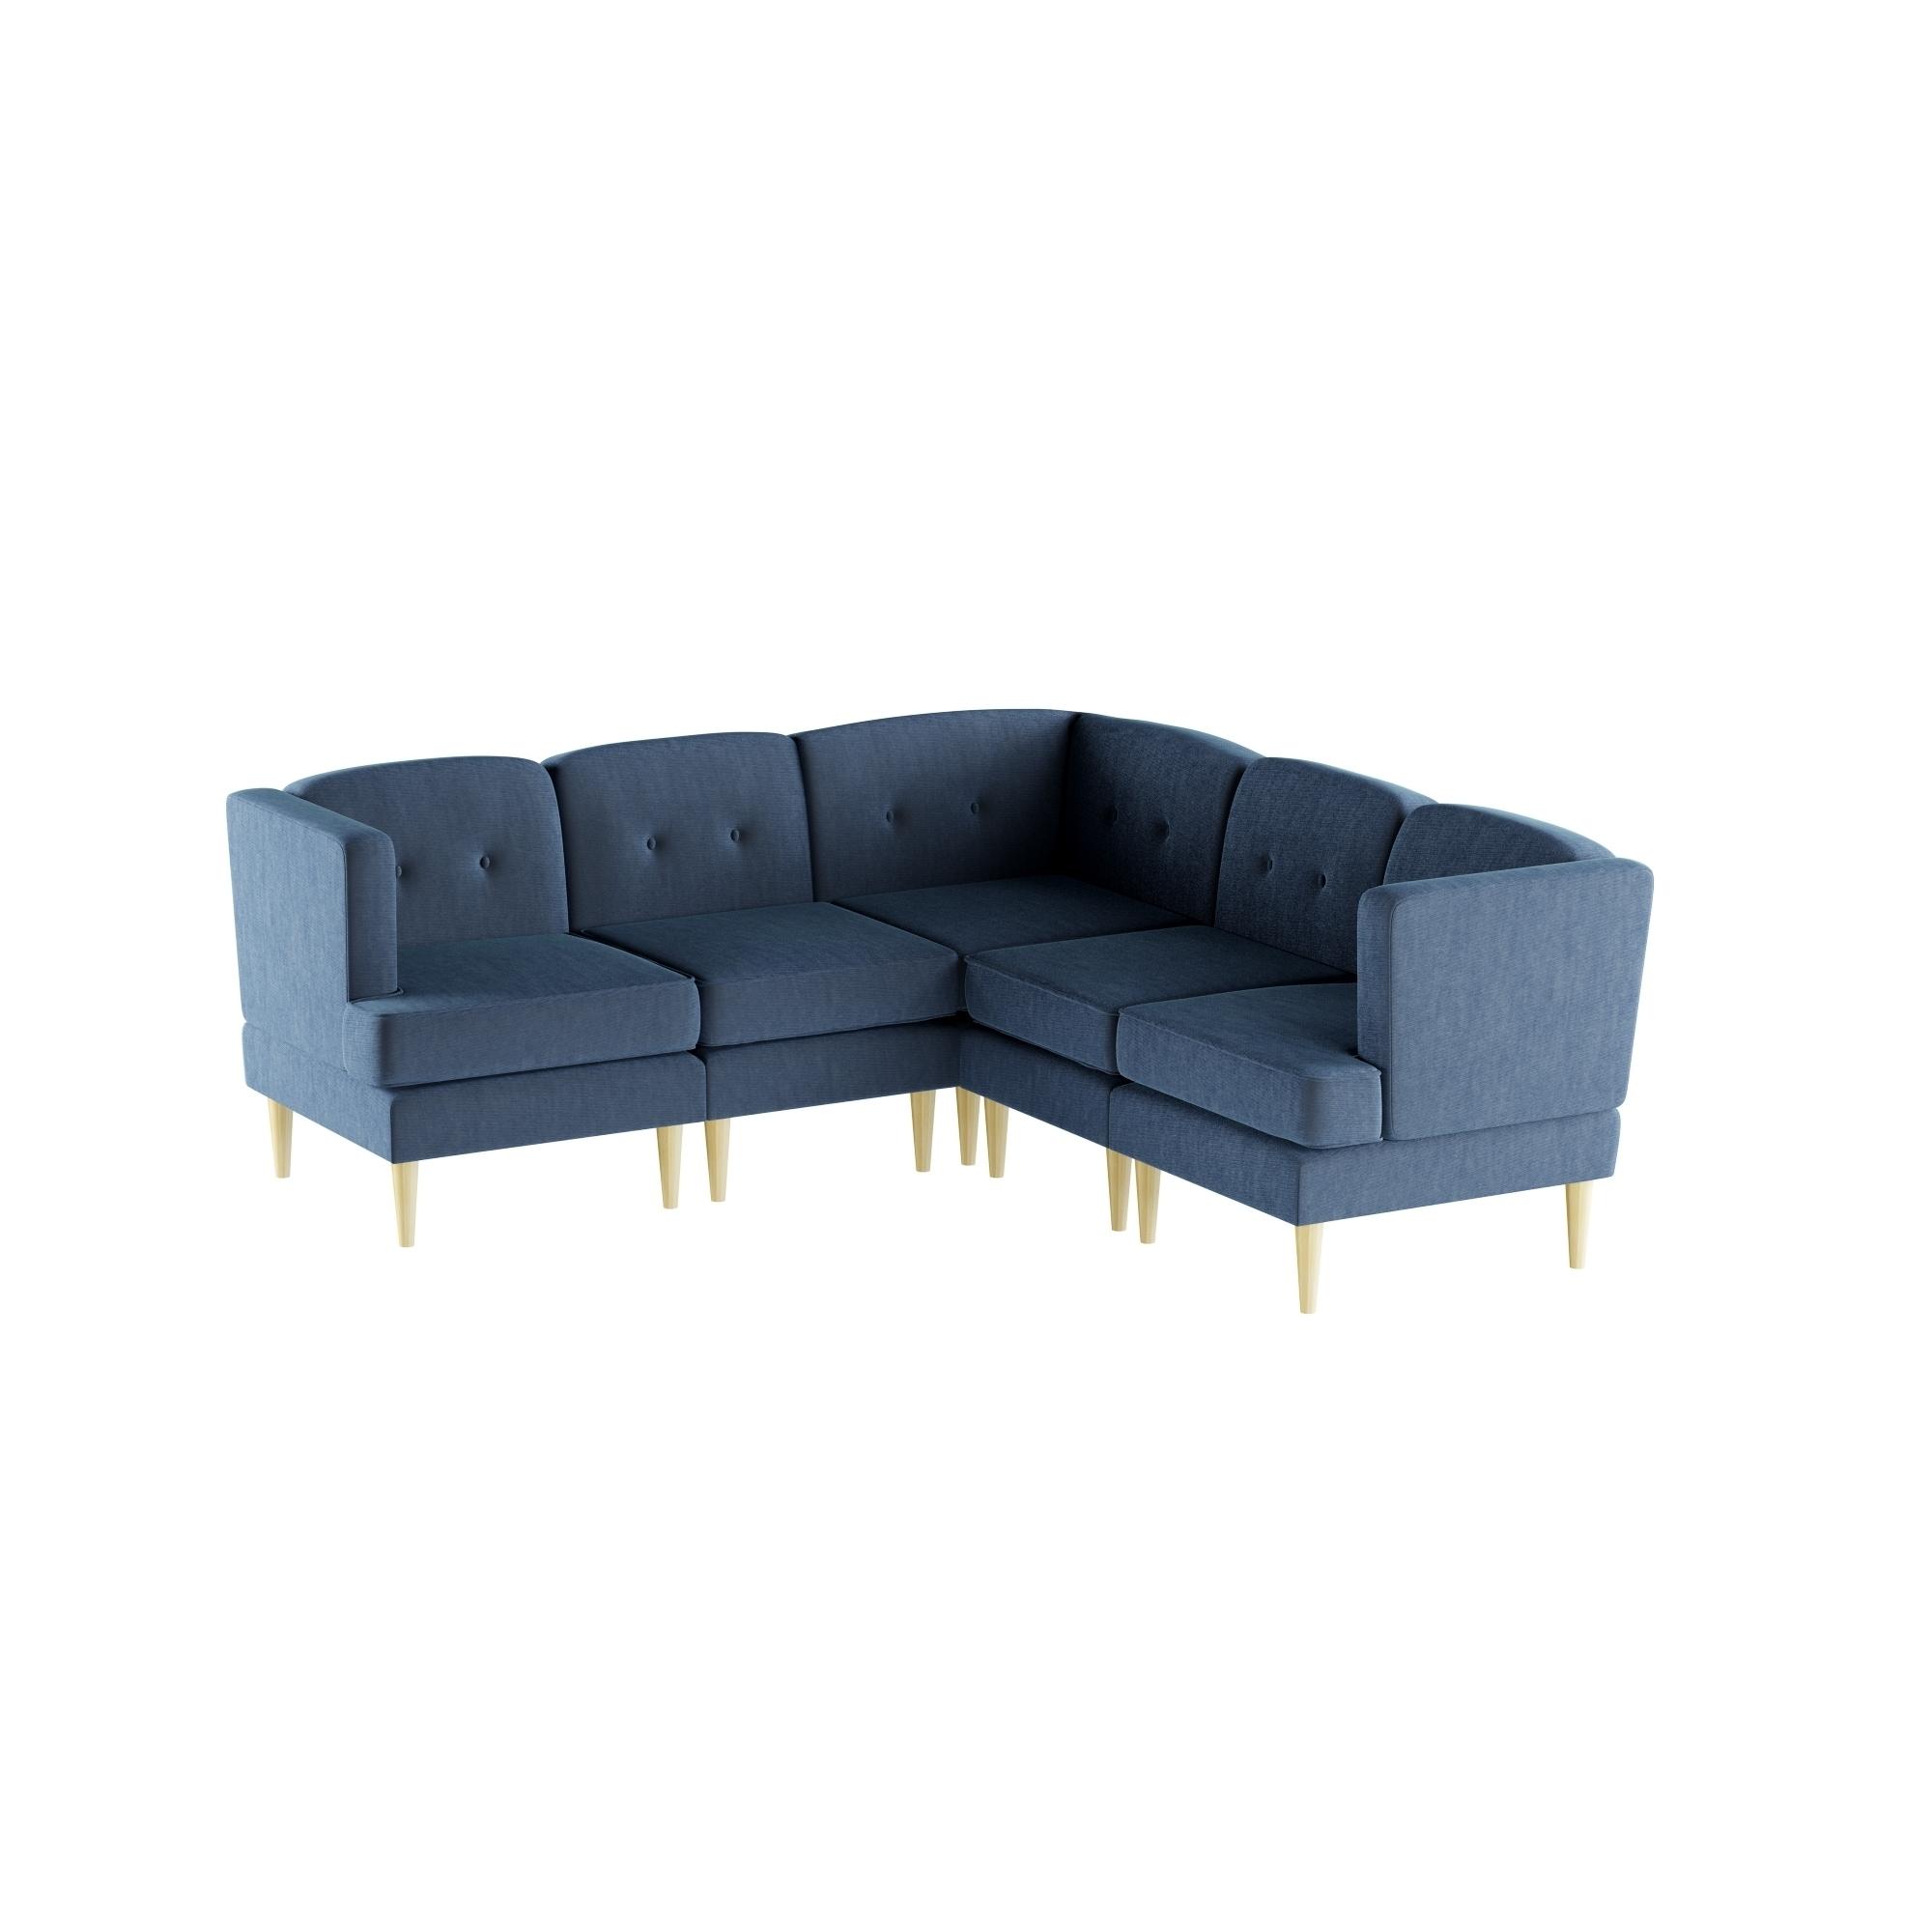 Prime Carson Carrington Larvik Mid Century Modern 5 Piece Fabric Unemploymentrelief Wooden Chair Designs For Living Room Unemploymentrelieforg